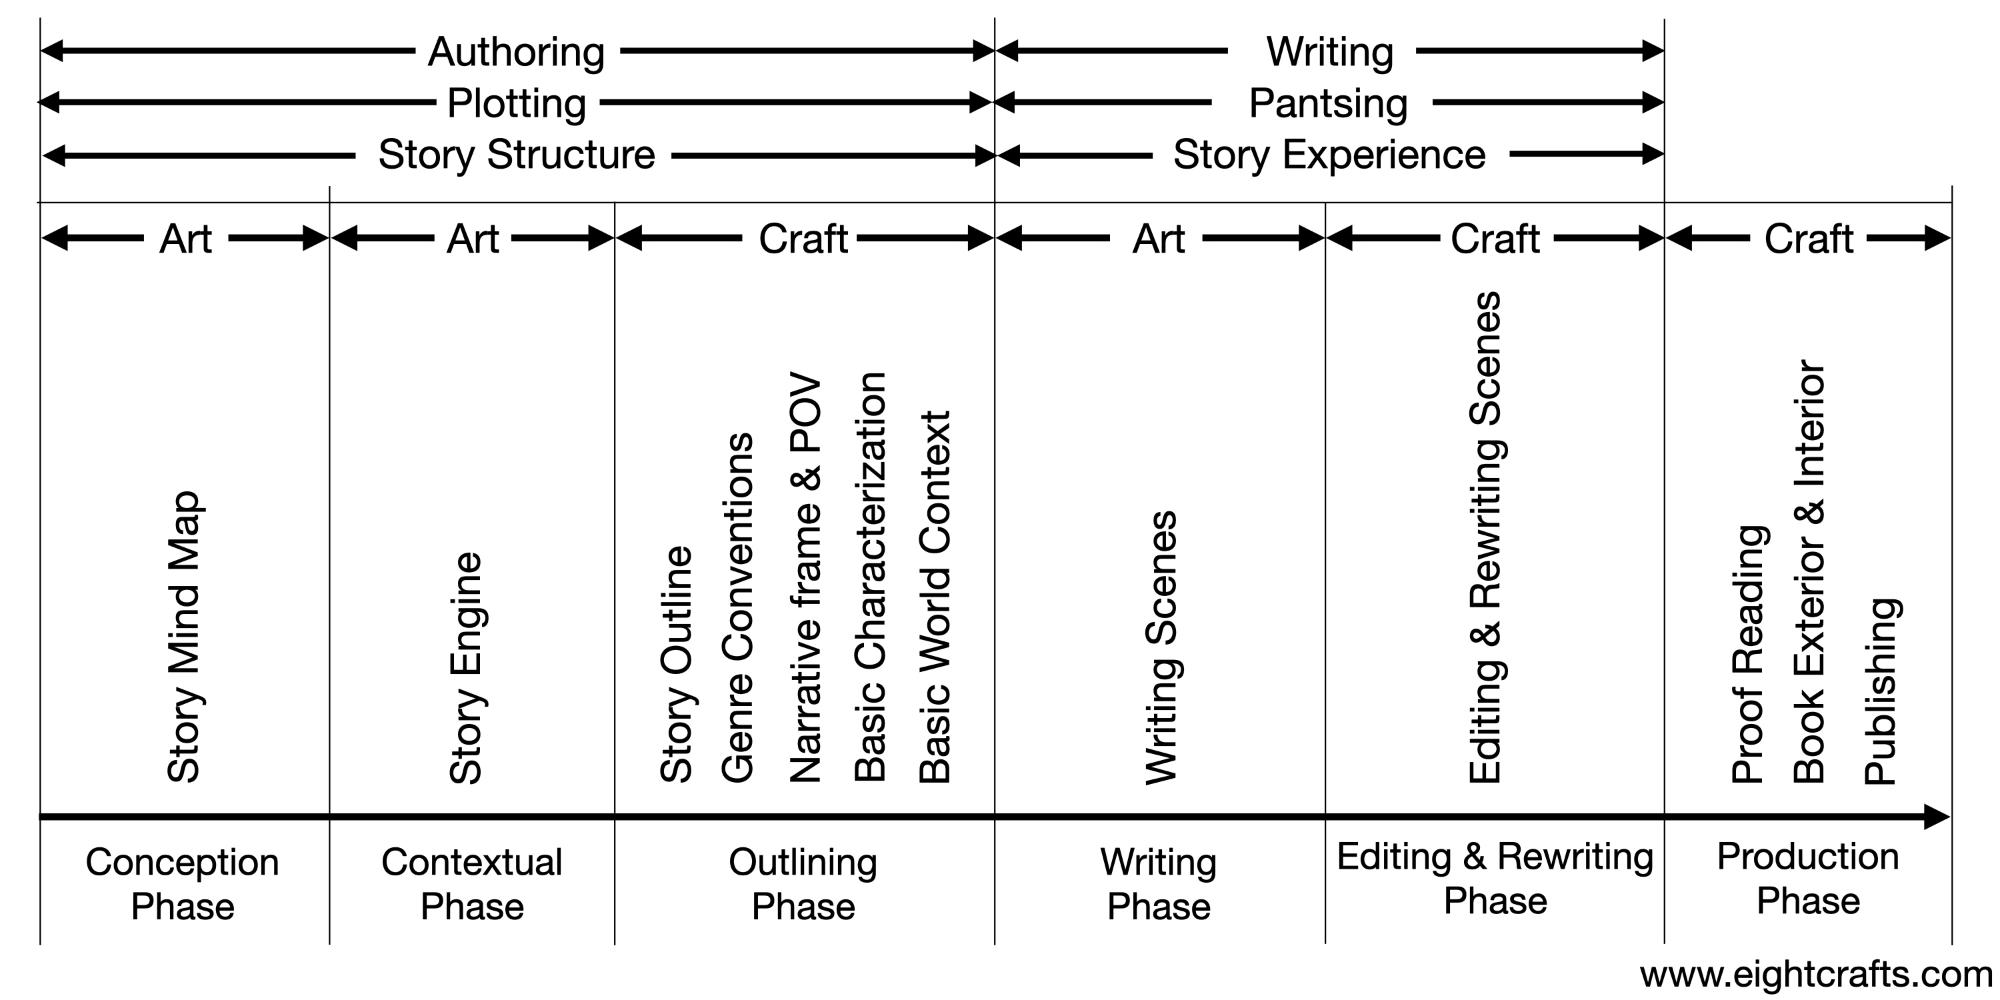 Authoring & Writing Phases